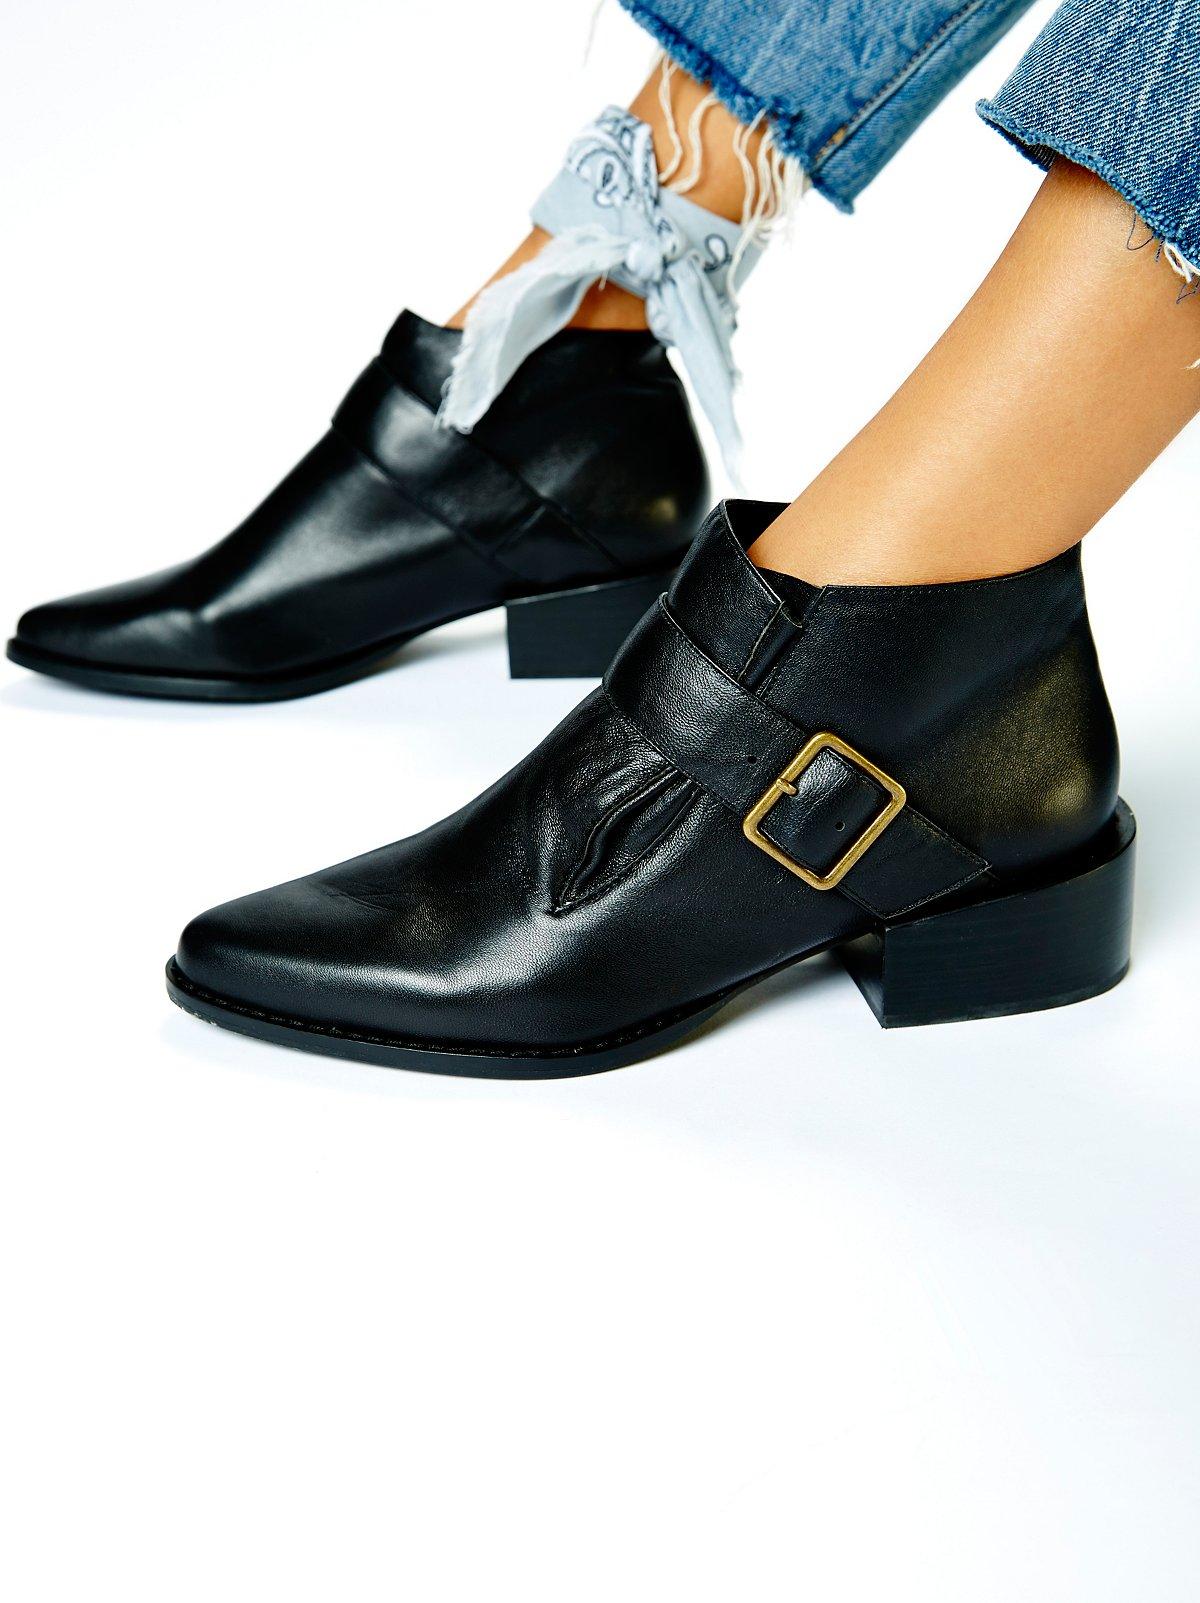 Avalon Menswear Boot